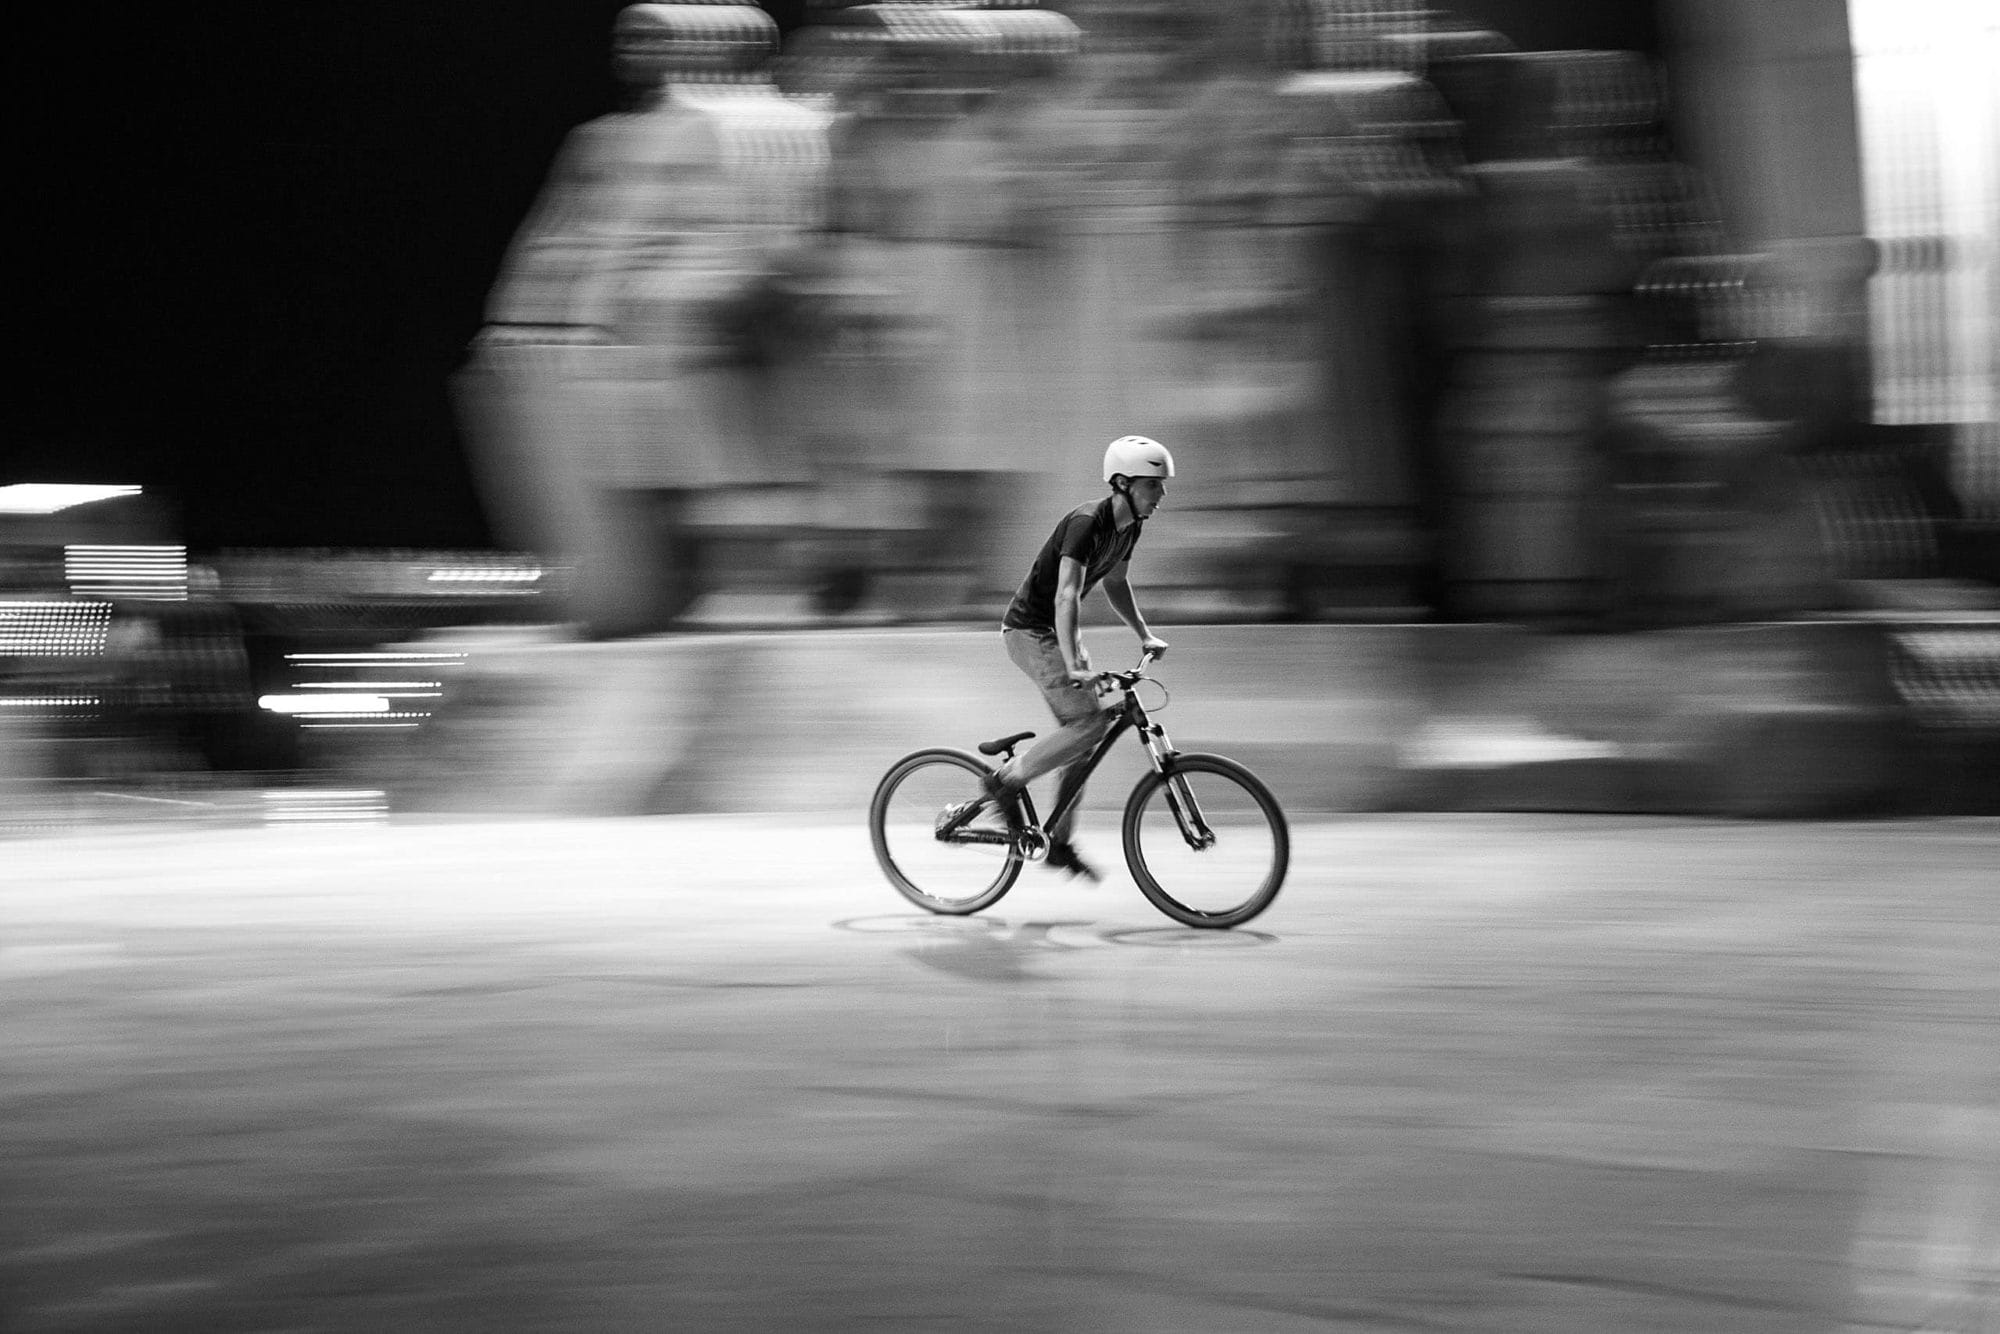 Фото велосипедиста